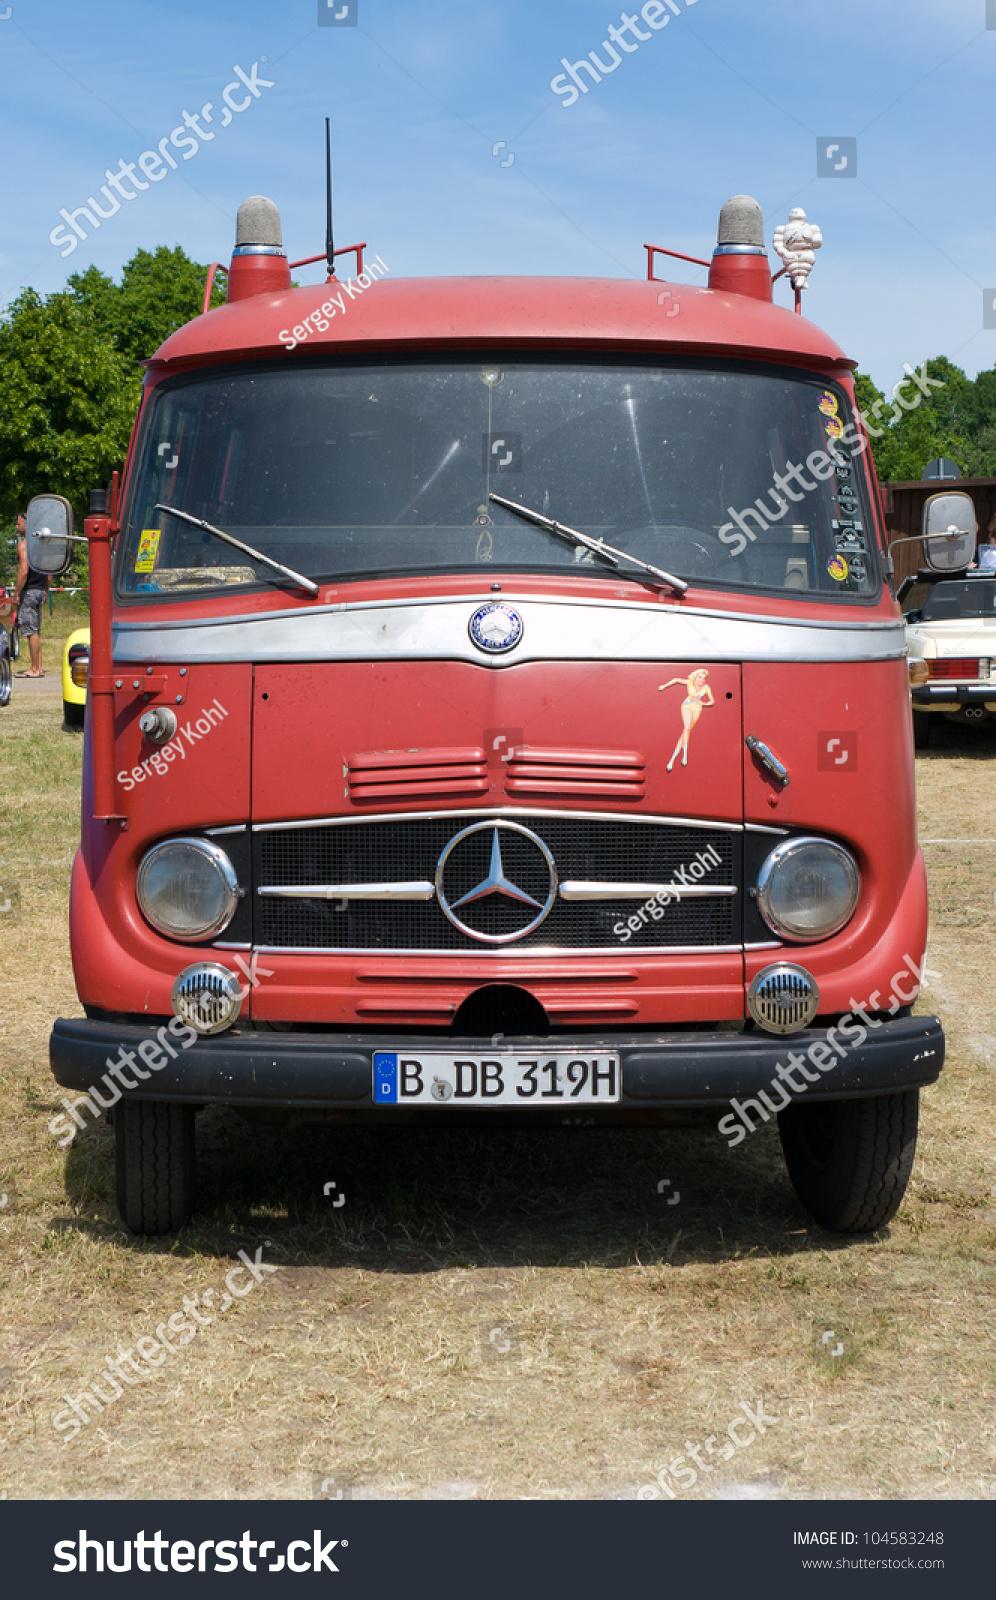 Paaren im glien germany may 26 minibus emergency for Mercedes benz emergency service